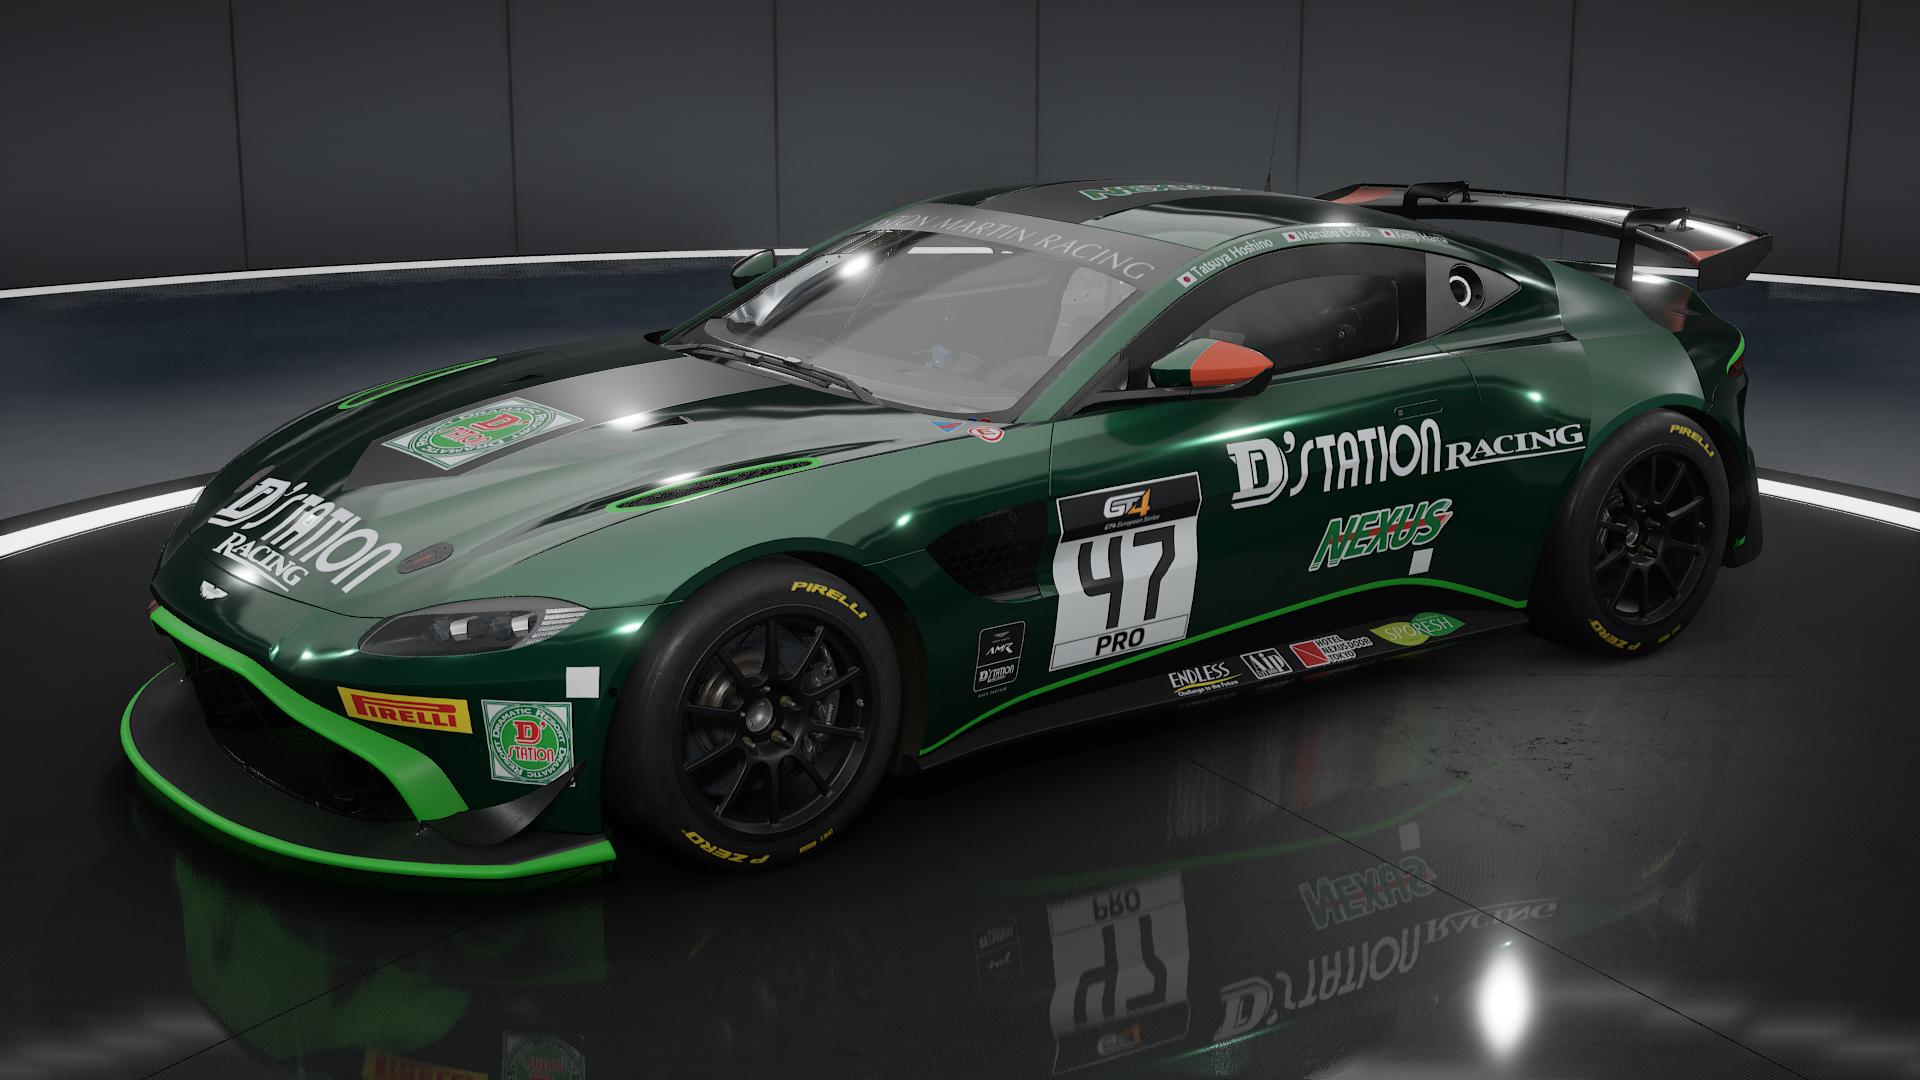 2020 D Station Racing Aston Martin Vantage Gt4 Racedepartment